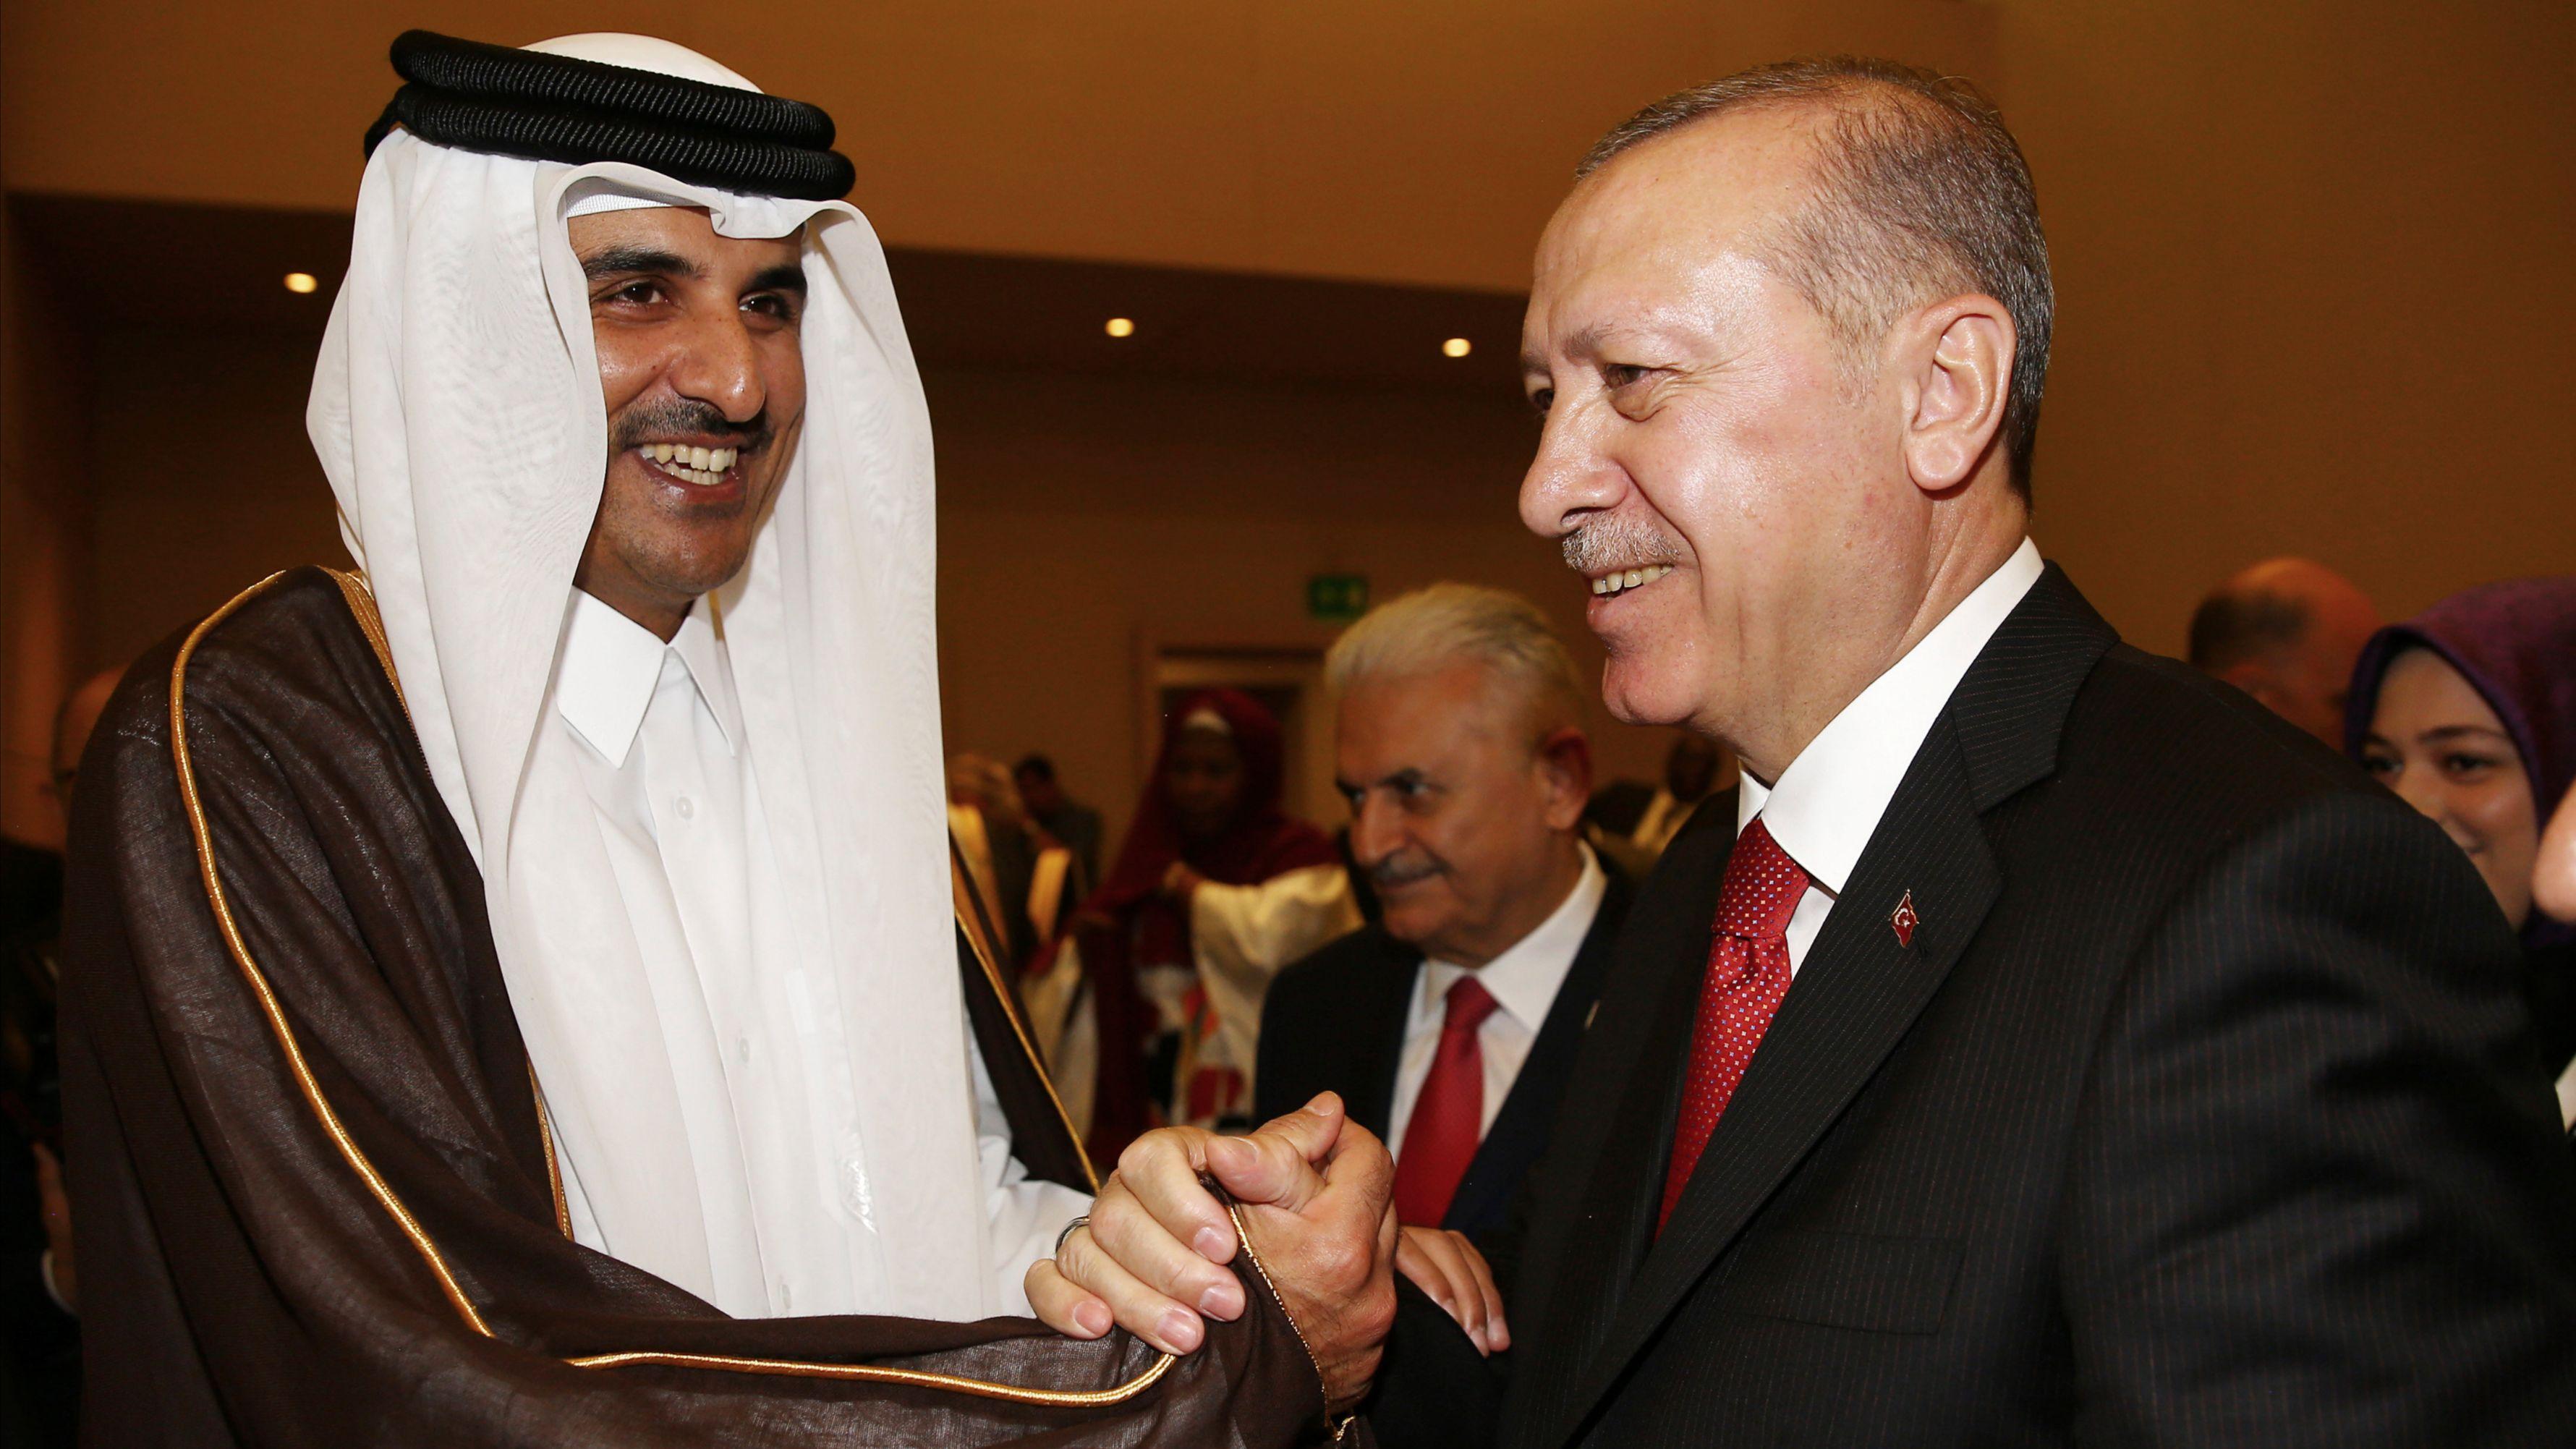 Turkish President Recep Tayyip Erdogan, right, and Qatari Emir Tamim bin Hamad al-Thani speak during an extraordinary summit of the Organization of Islamic Cooperation, in Istanbul, Turkey, May 18, 2018. (Presidential Press Service via AP)